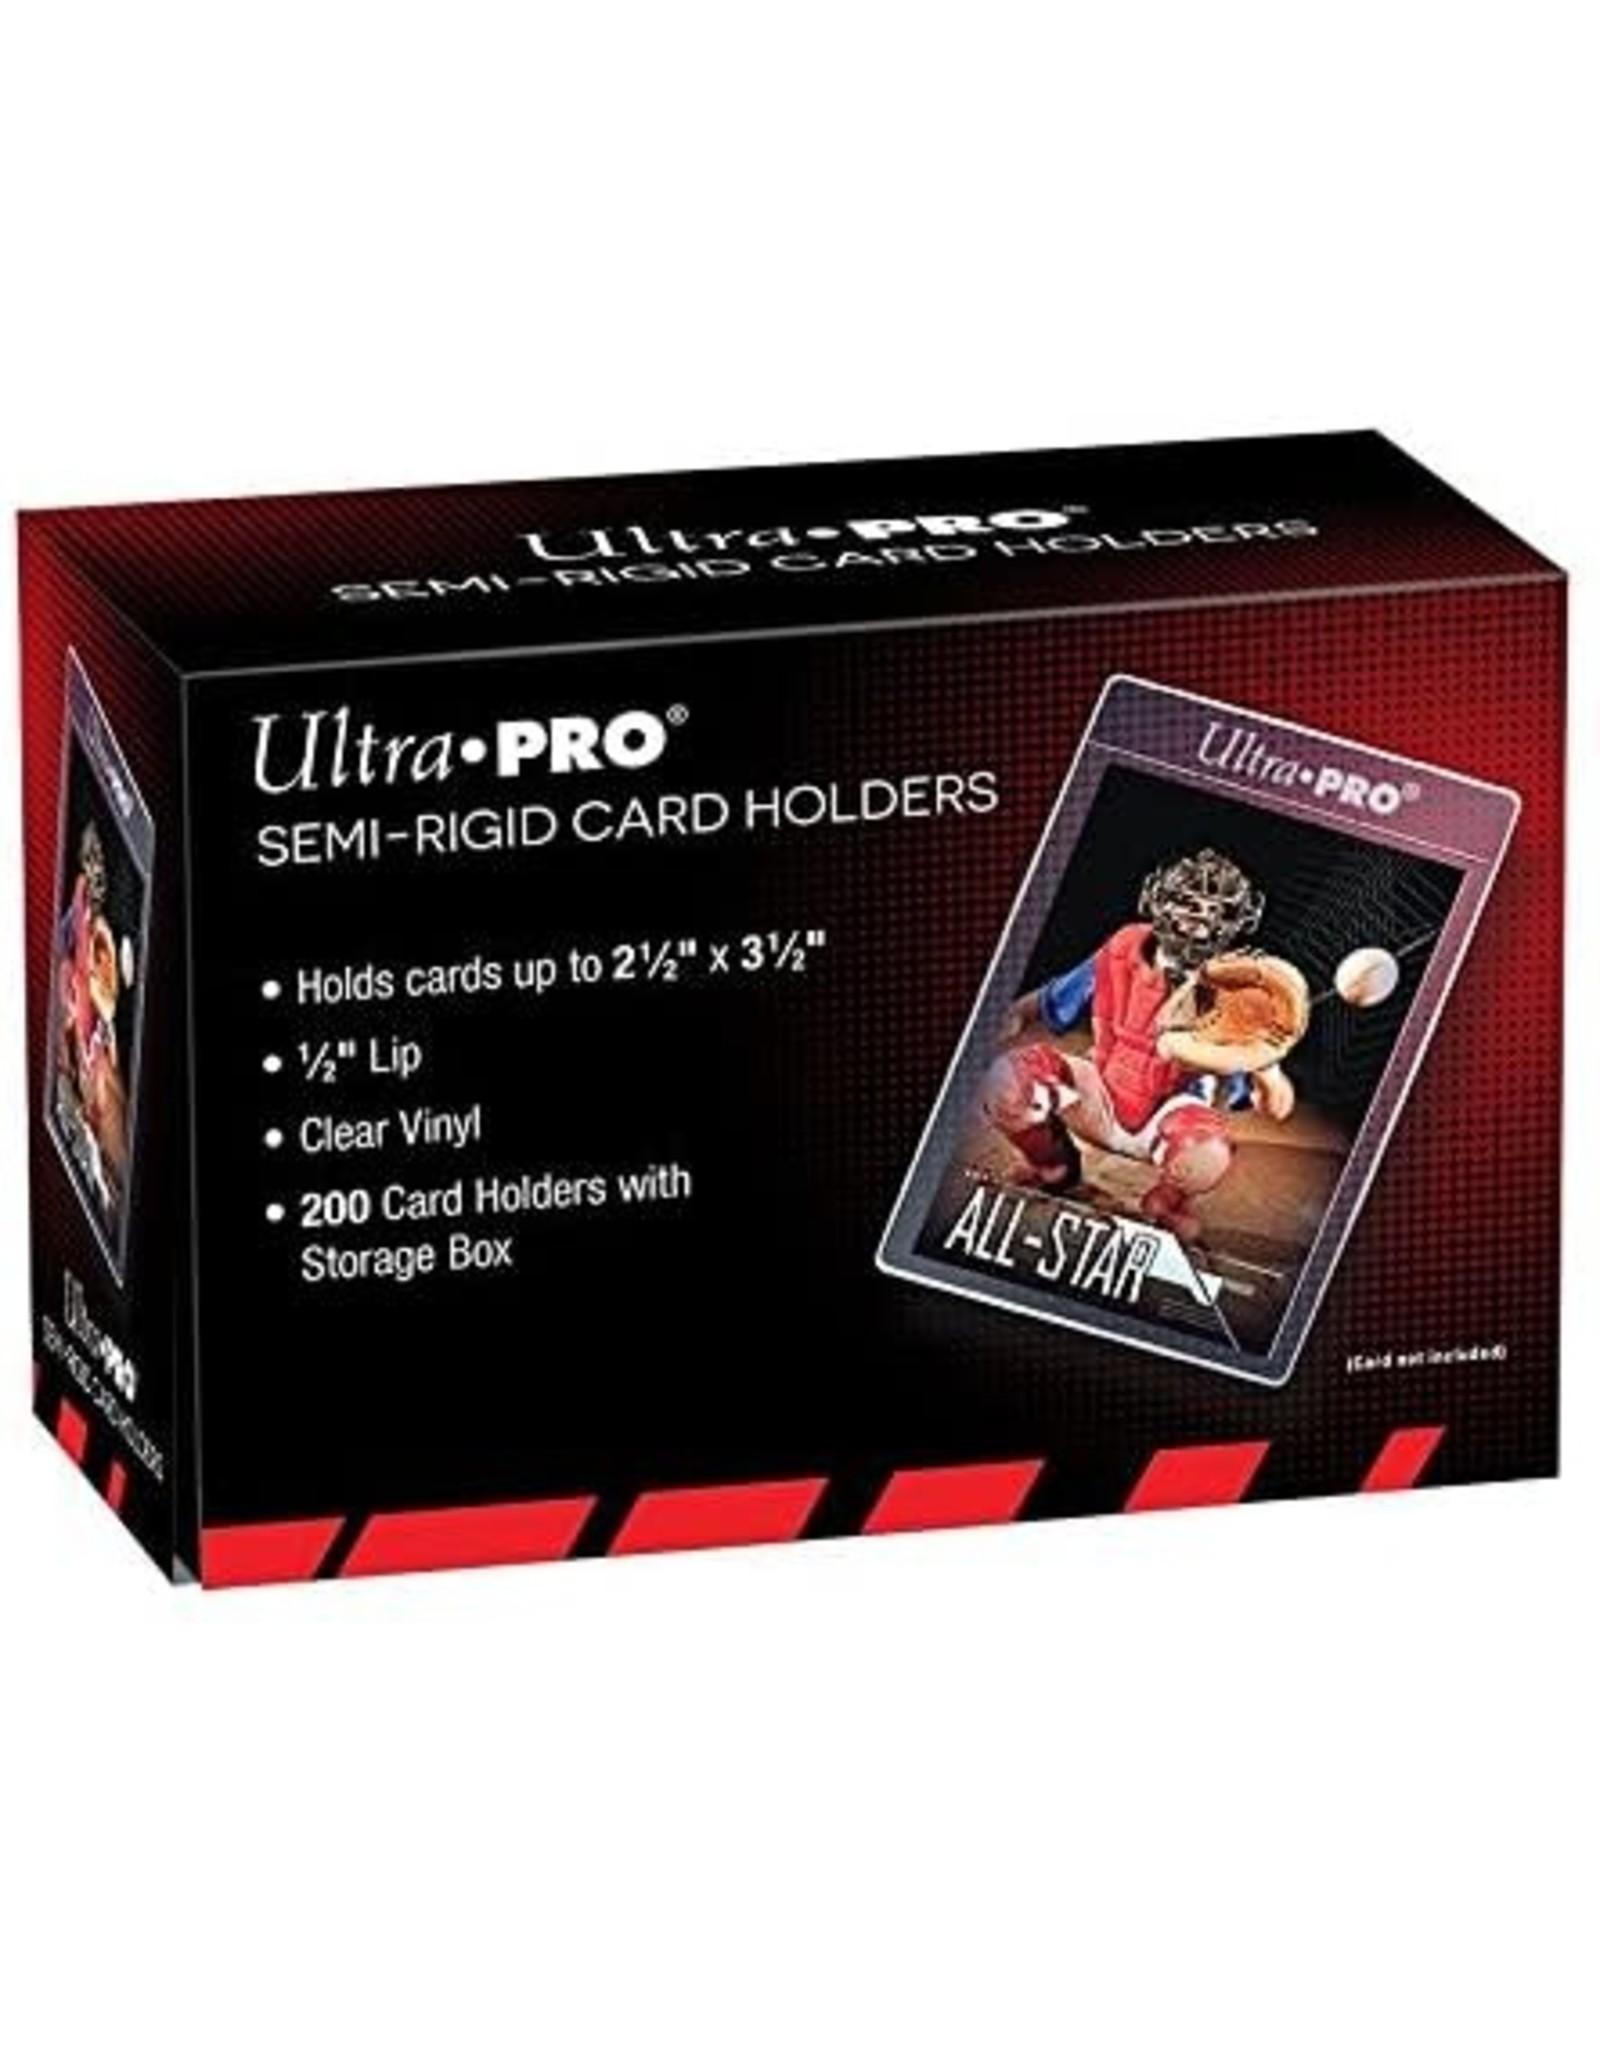 Ultra Pro Ultra Pro Semi-Rigid Card Holders (Card Savers) 200ct